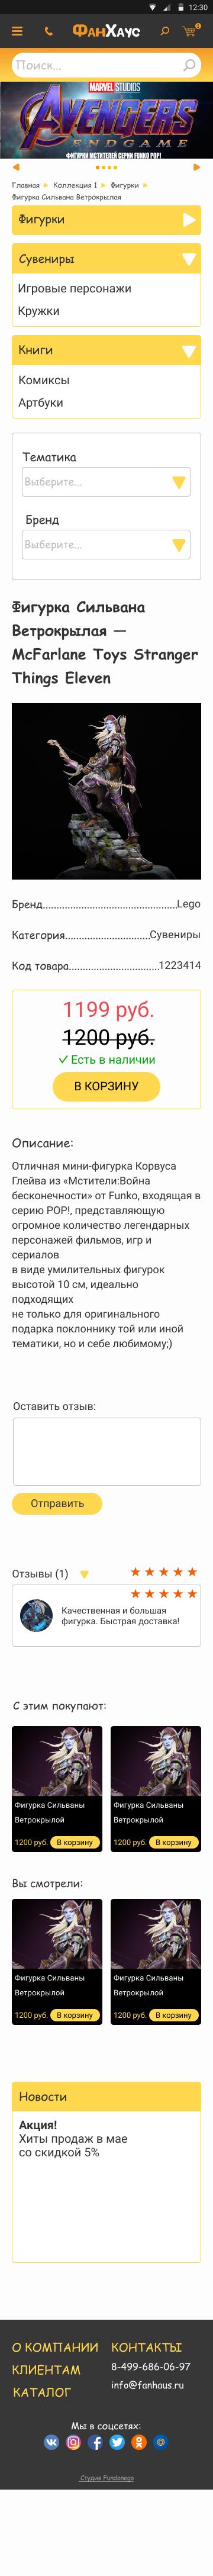 """Фанхаус"" - адаптивный дизайн страниц интернет-магазина"